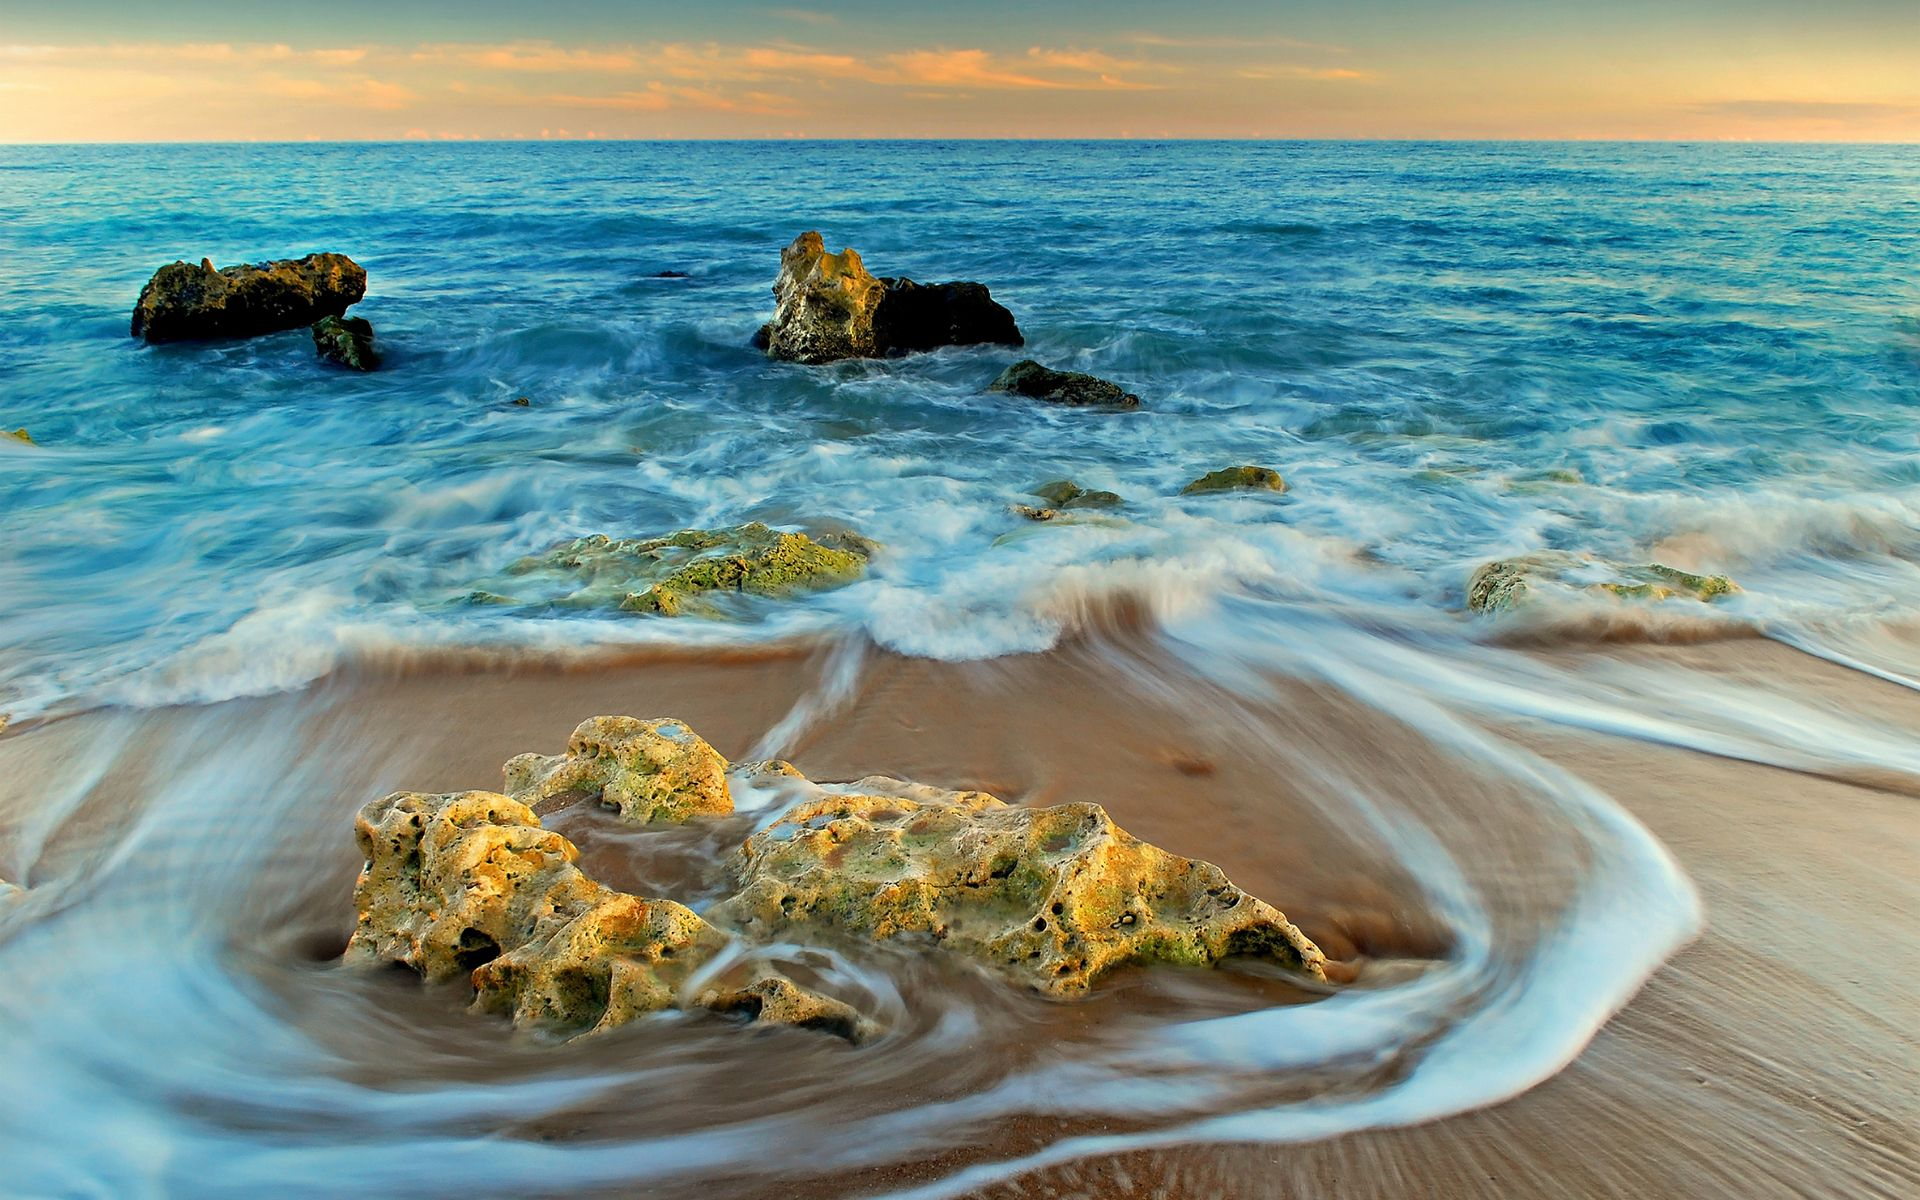 Hd Ocean Waves Wallpaper Download Free 63084 Ocean Waves Landscape Wallpaper Waves Wallpaper